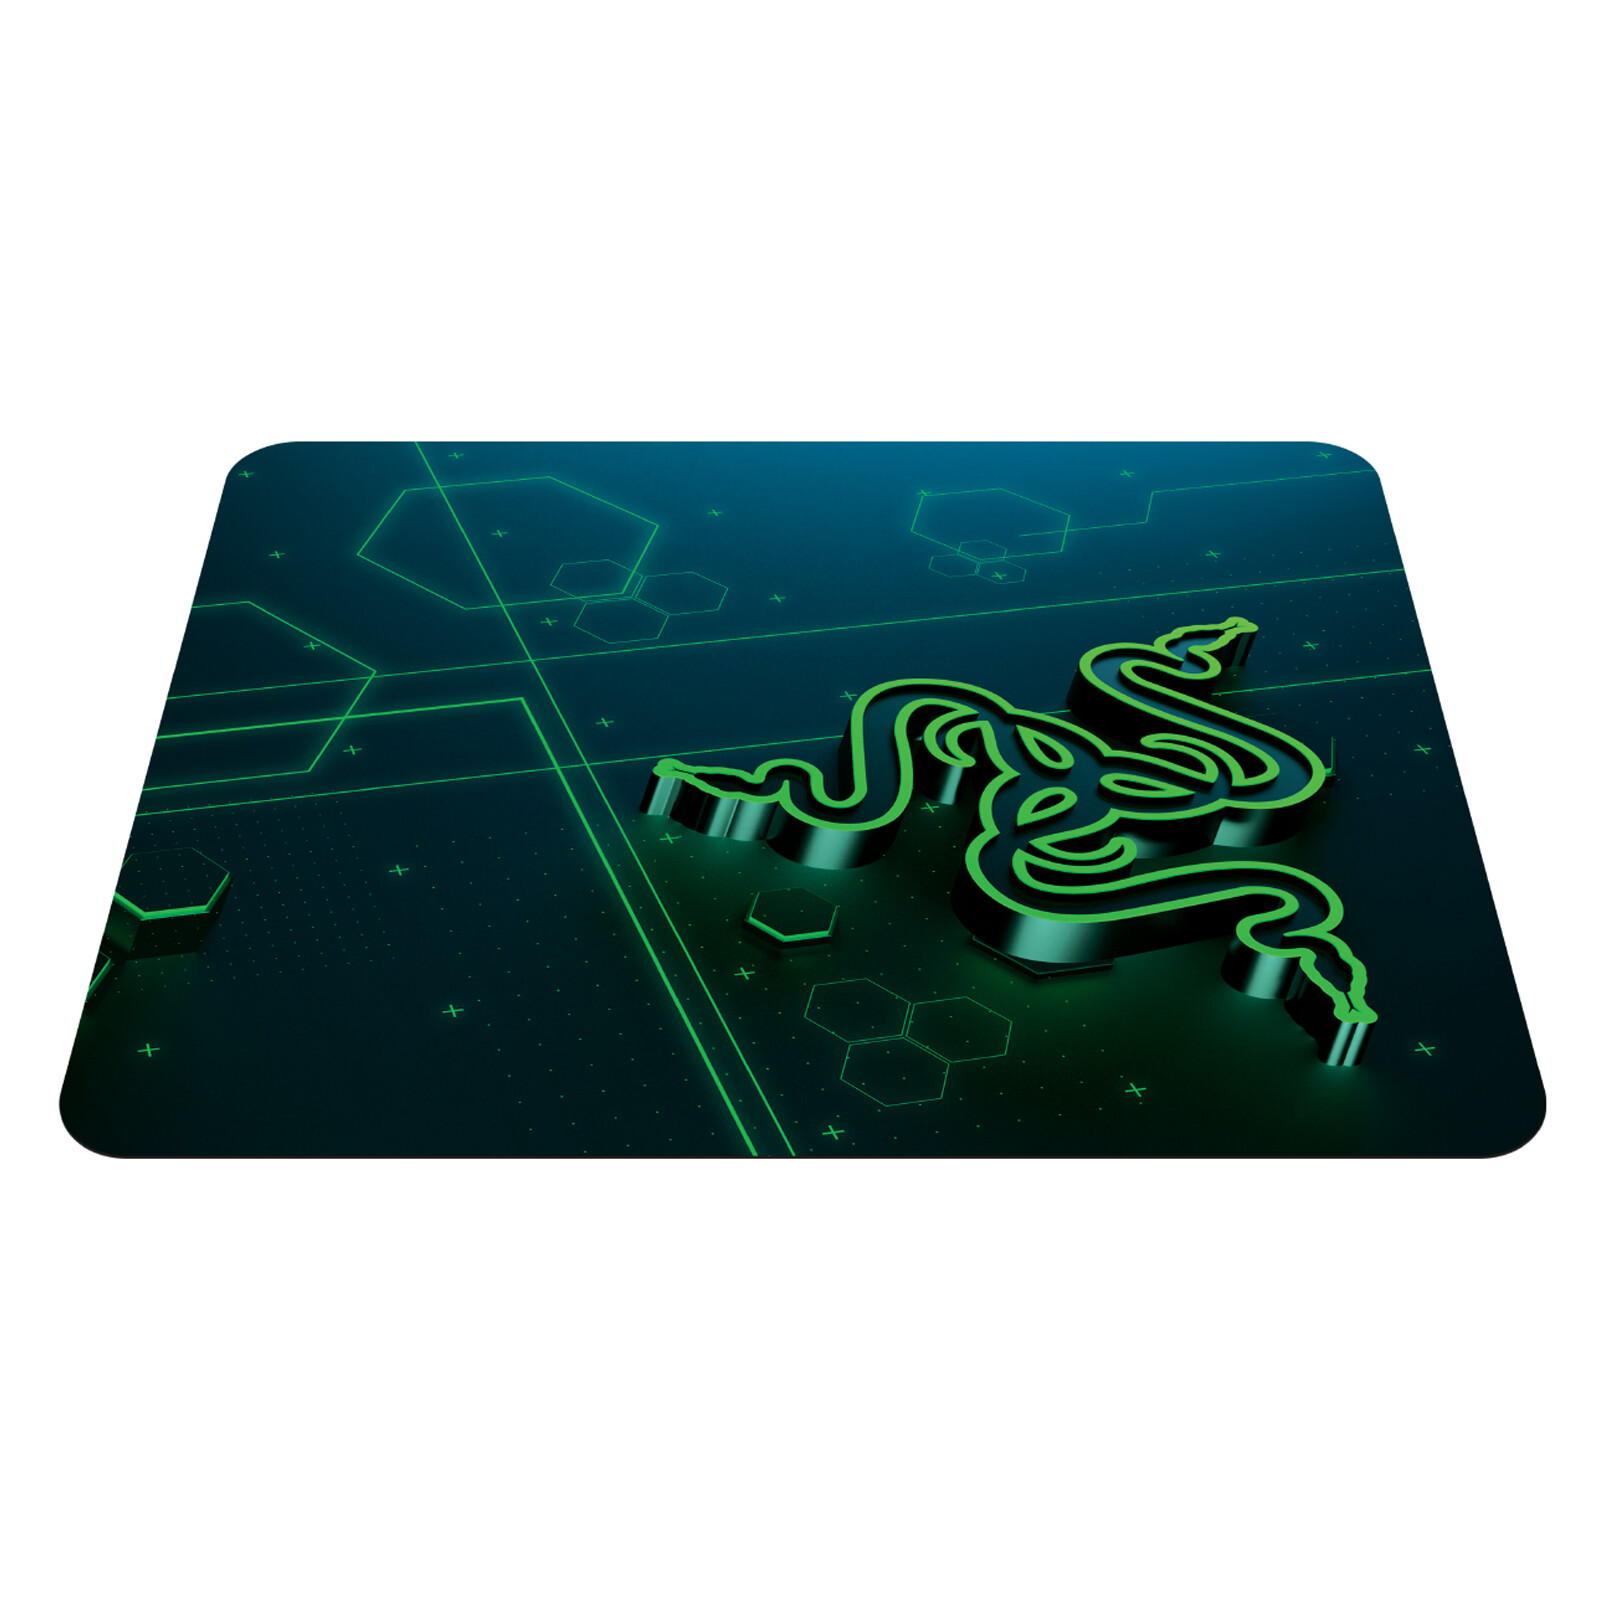 Razer Goliathus Mobile Mauspad/Mousepad